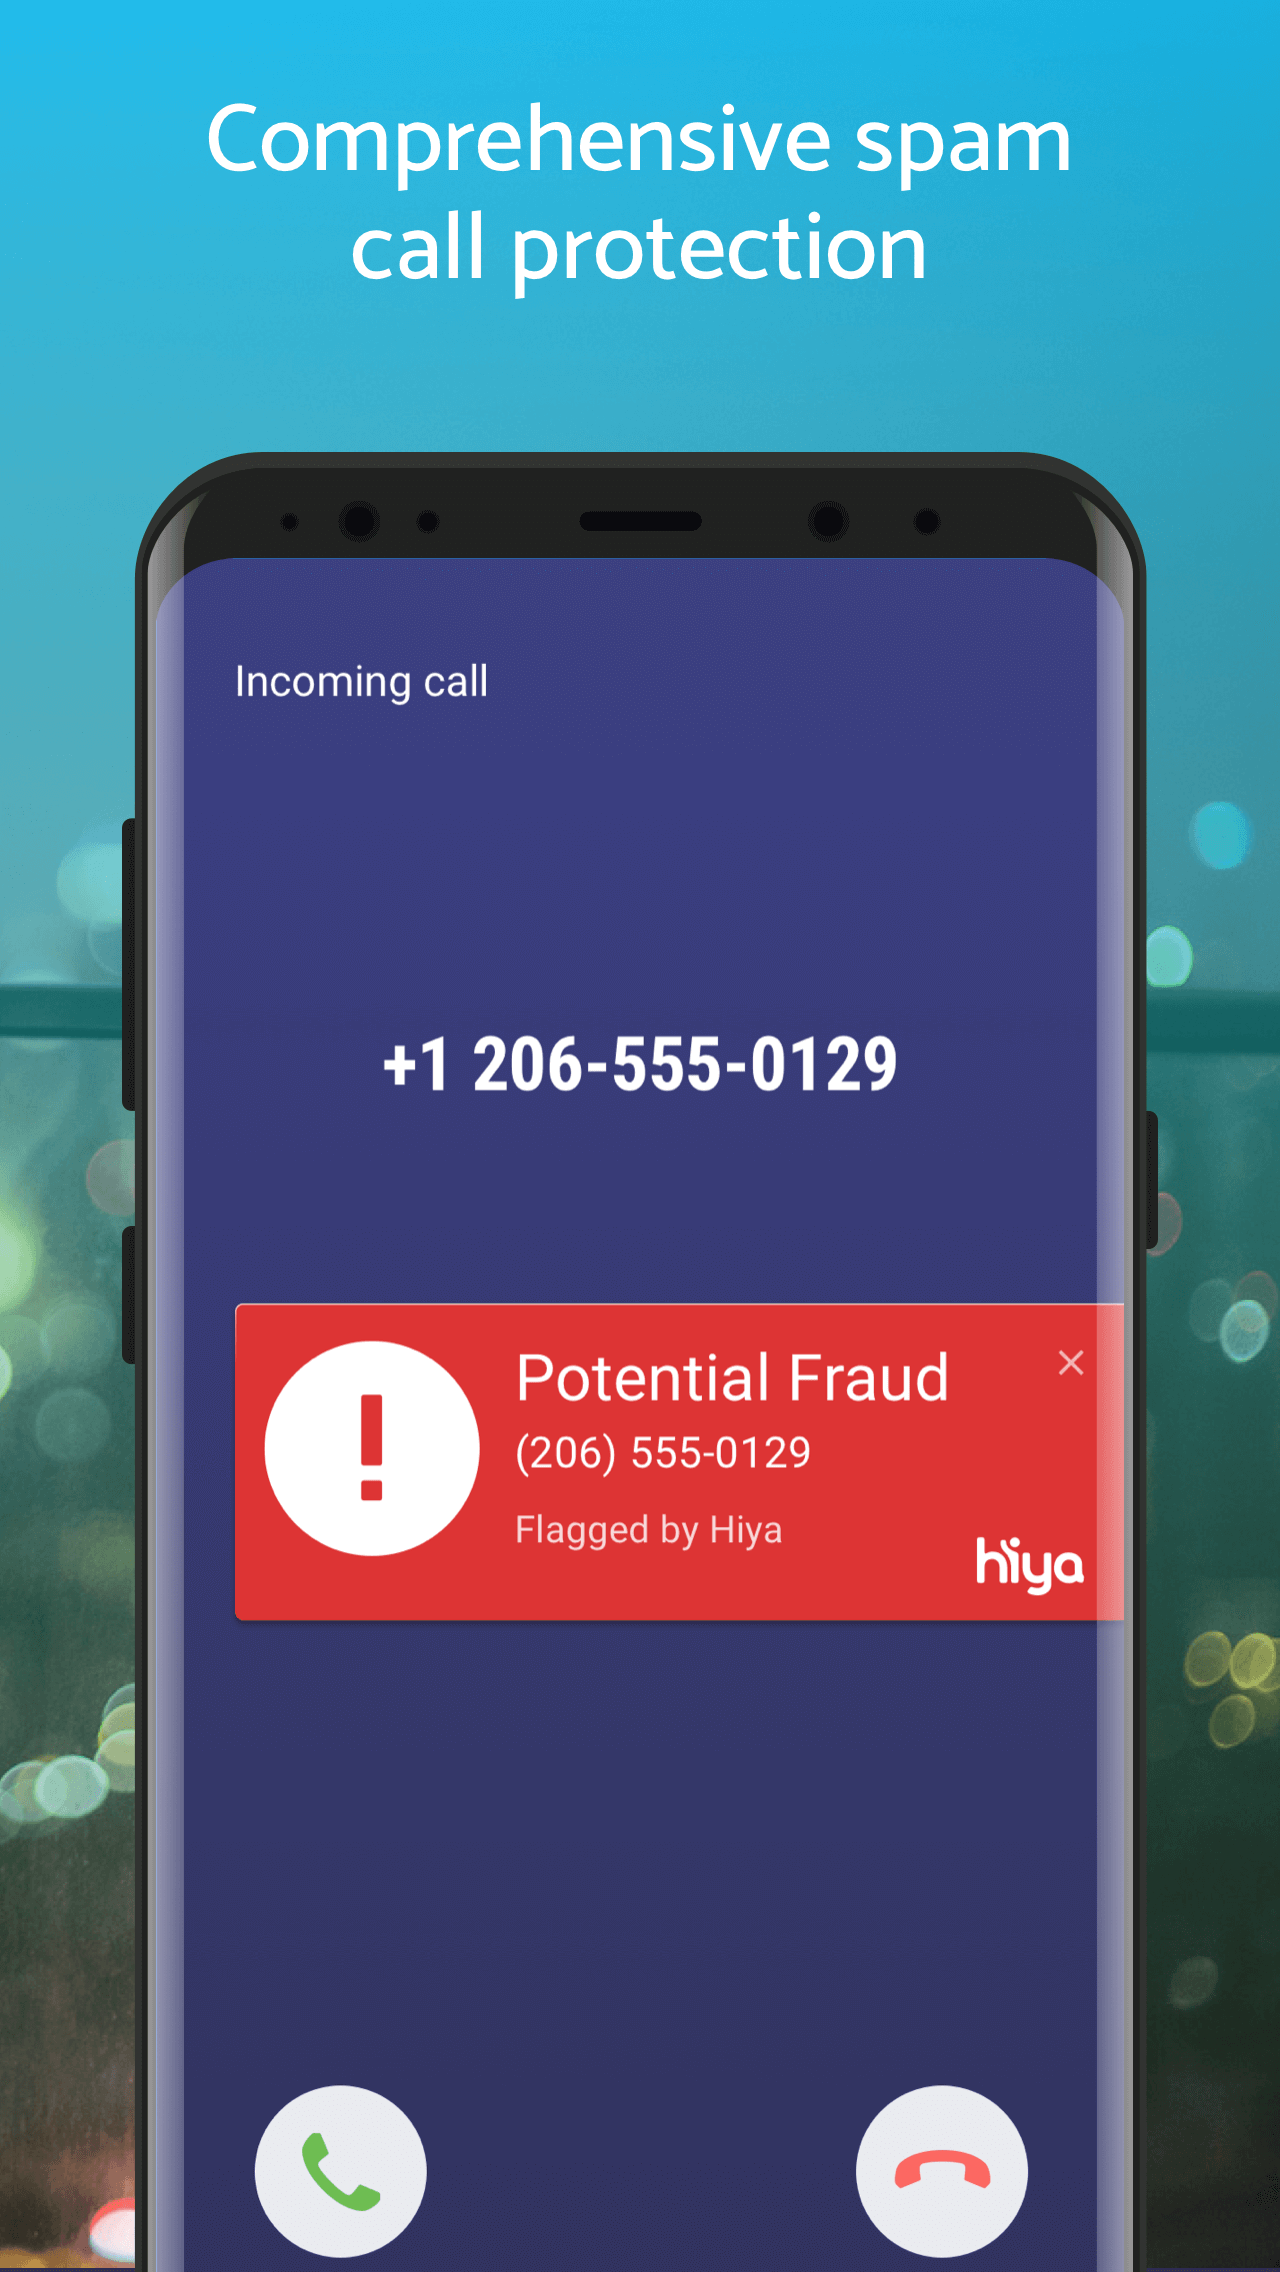 How to stop receiving unwanted calls